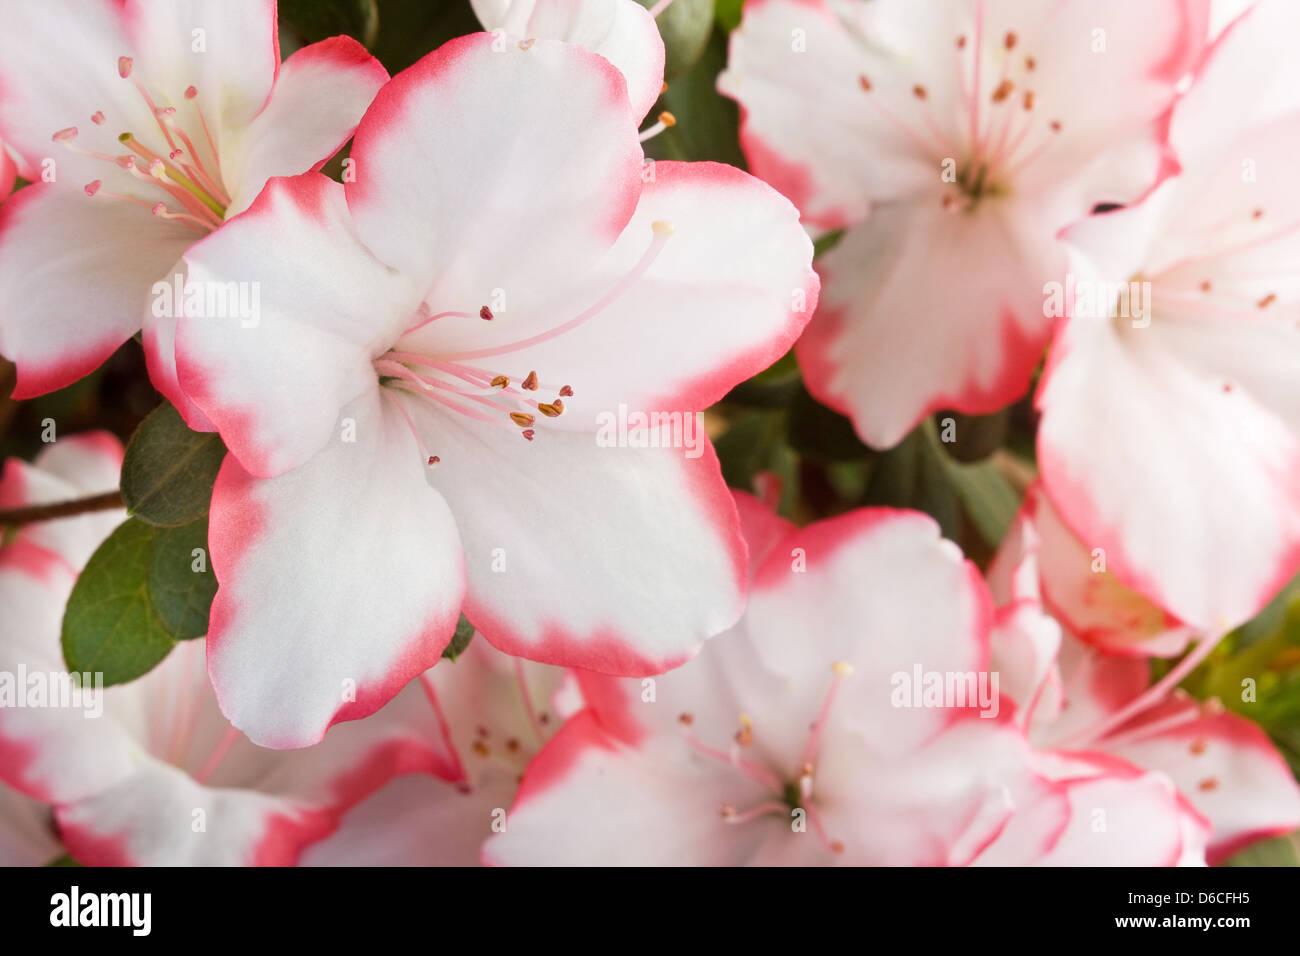 Azalea flowers - Rhododendron japonicum - Stock Image